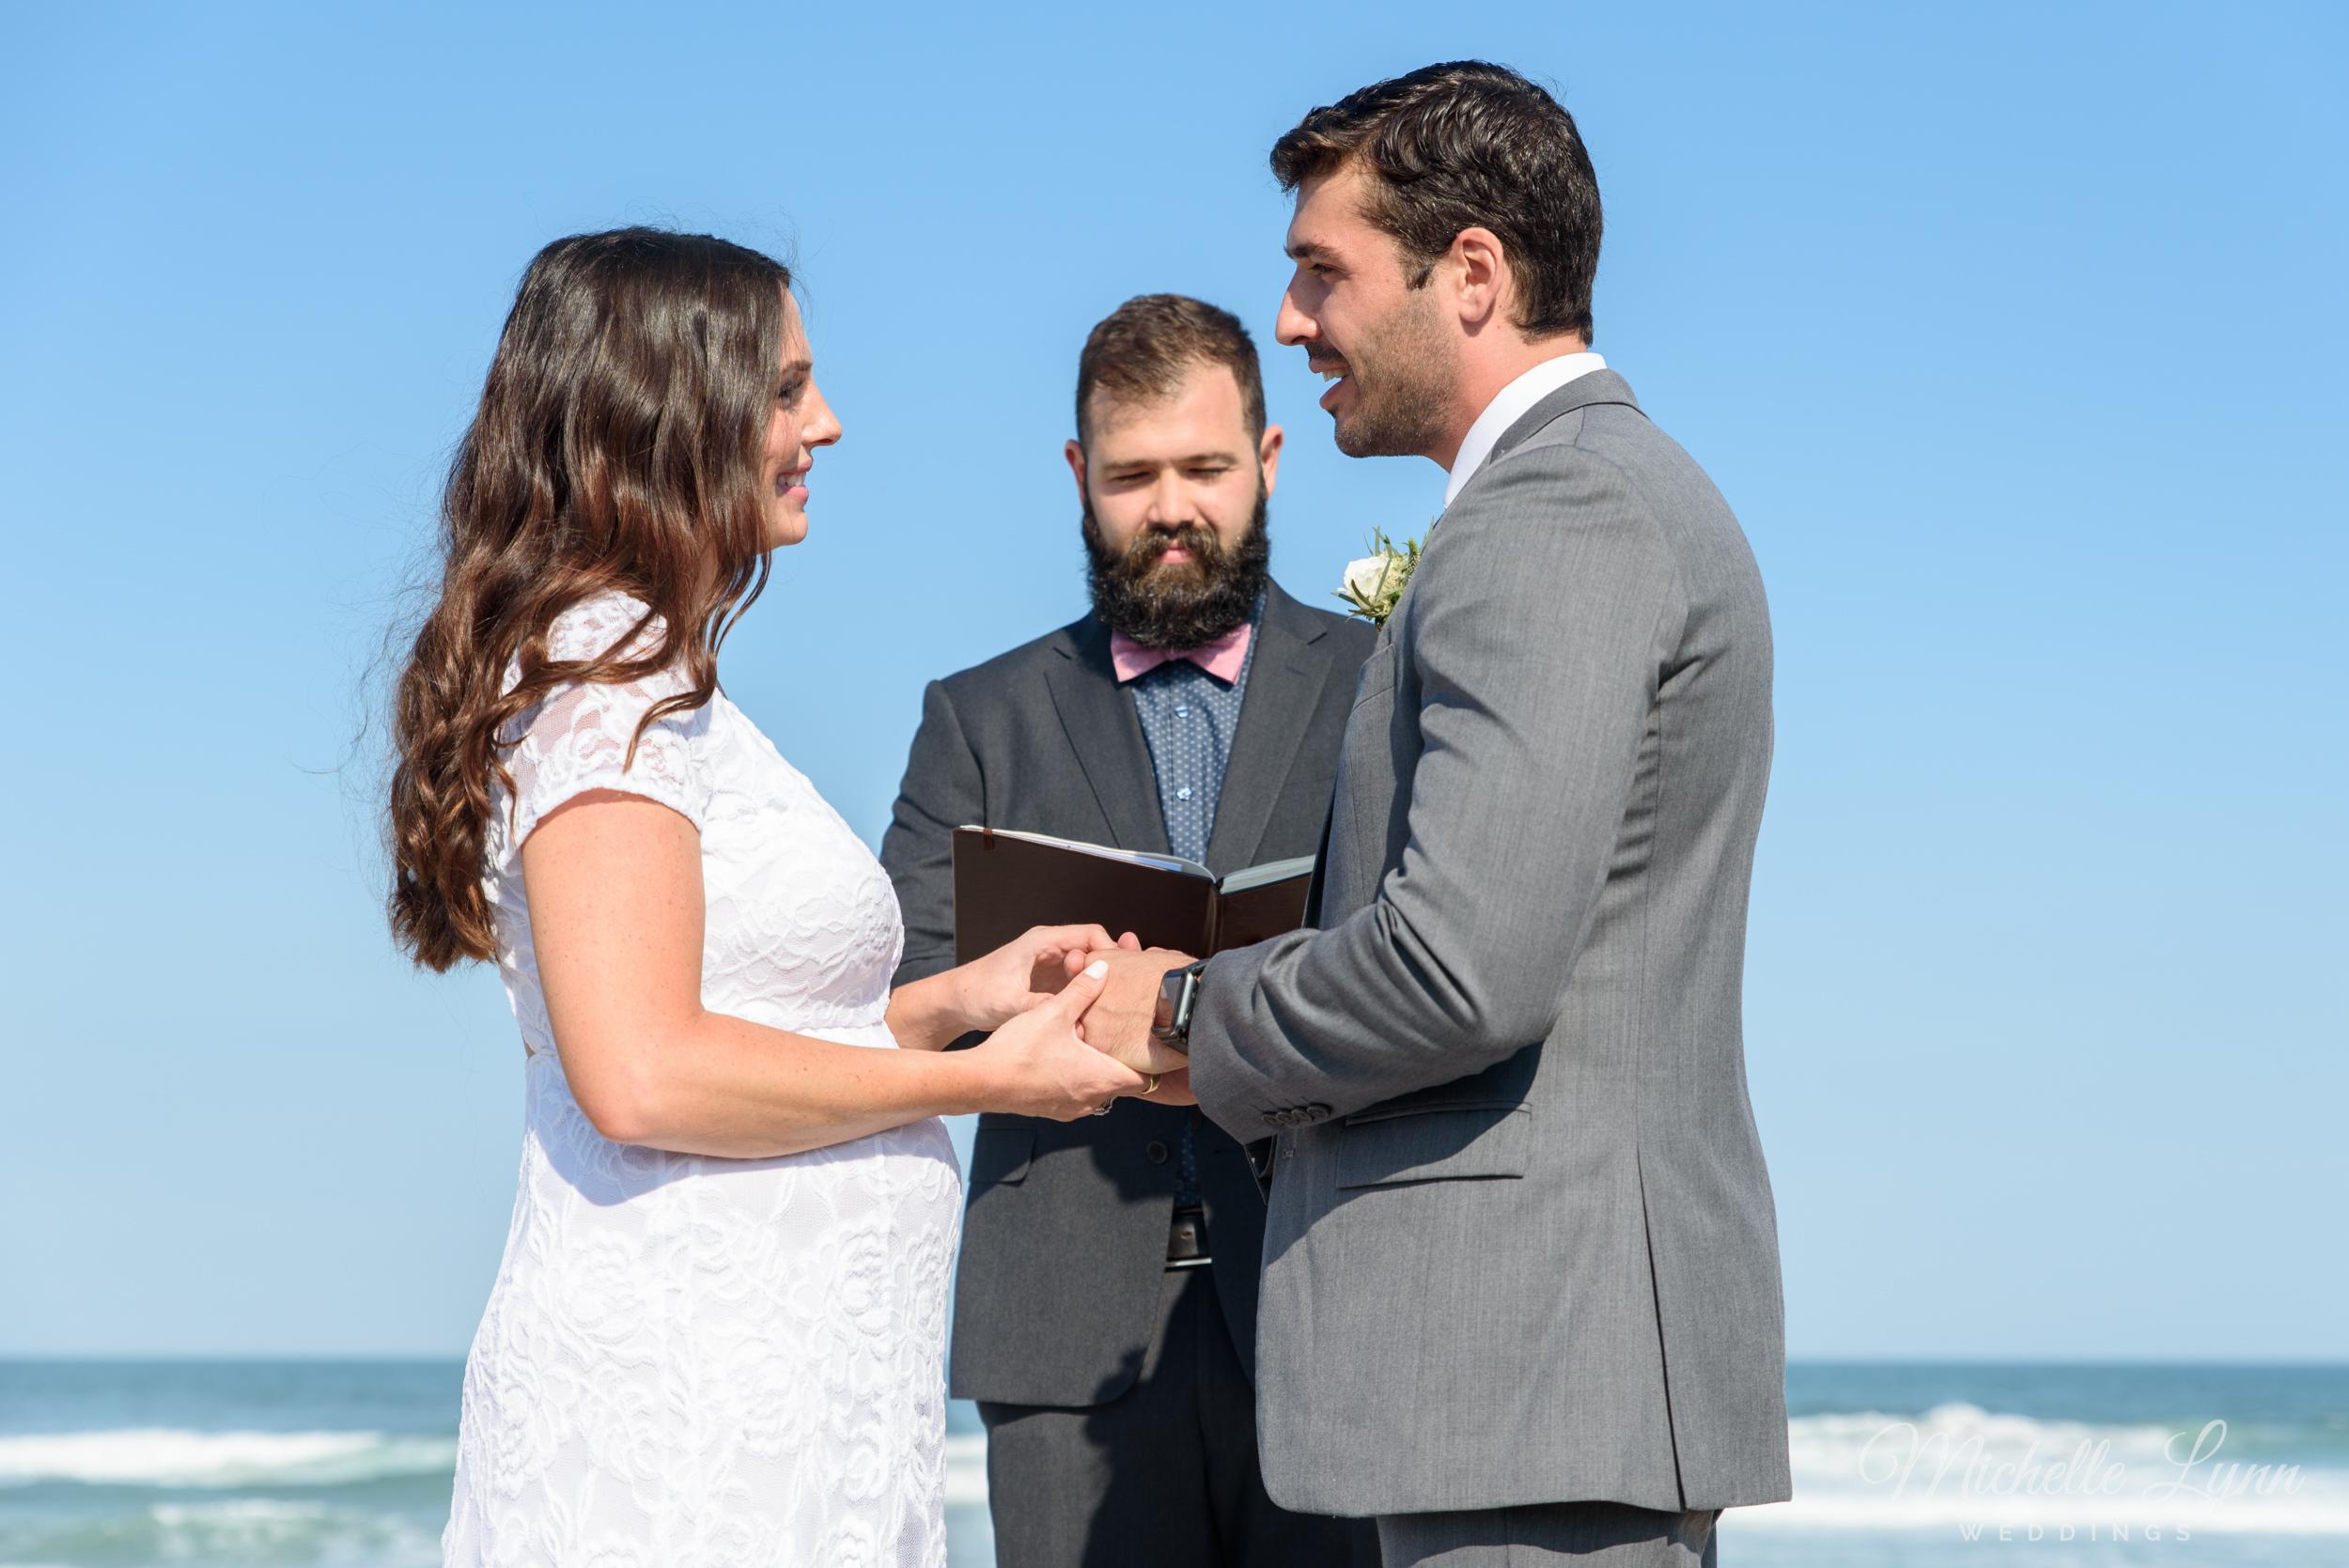 mlw-brant-beach-lbi-wedding-photography-30.jpg